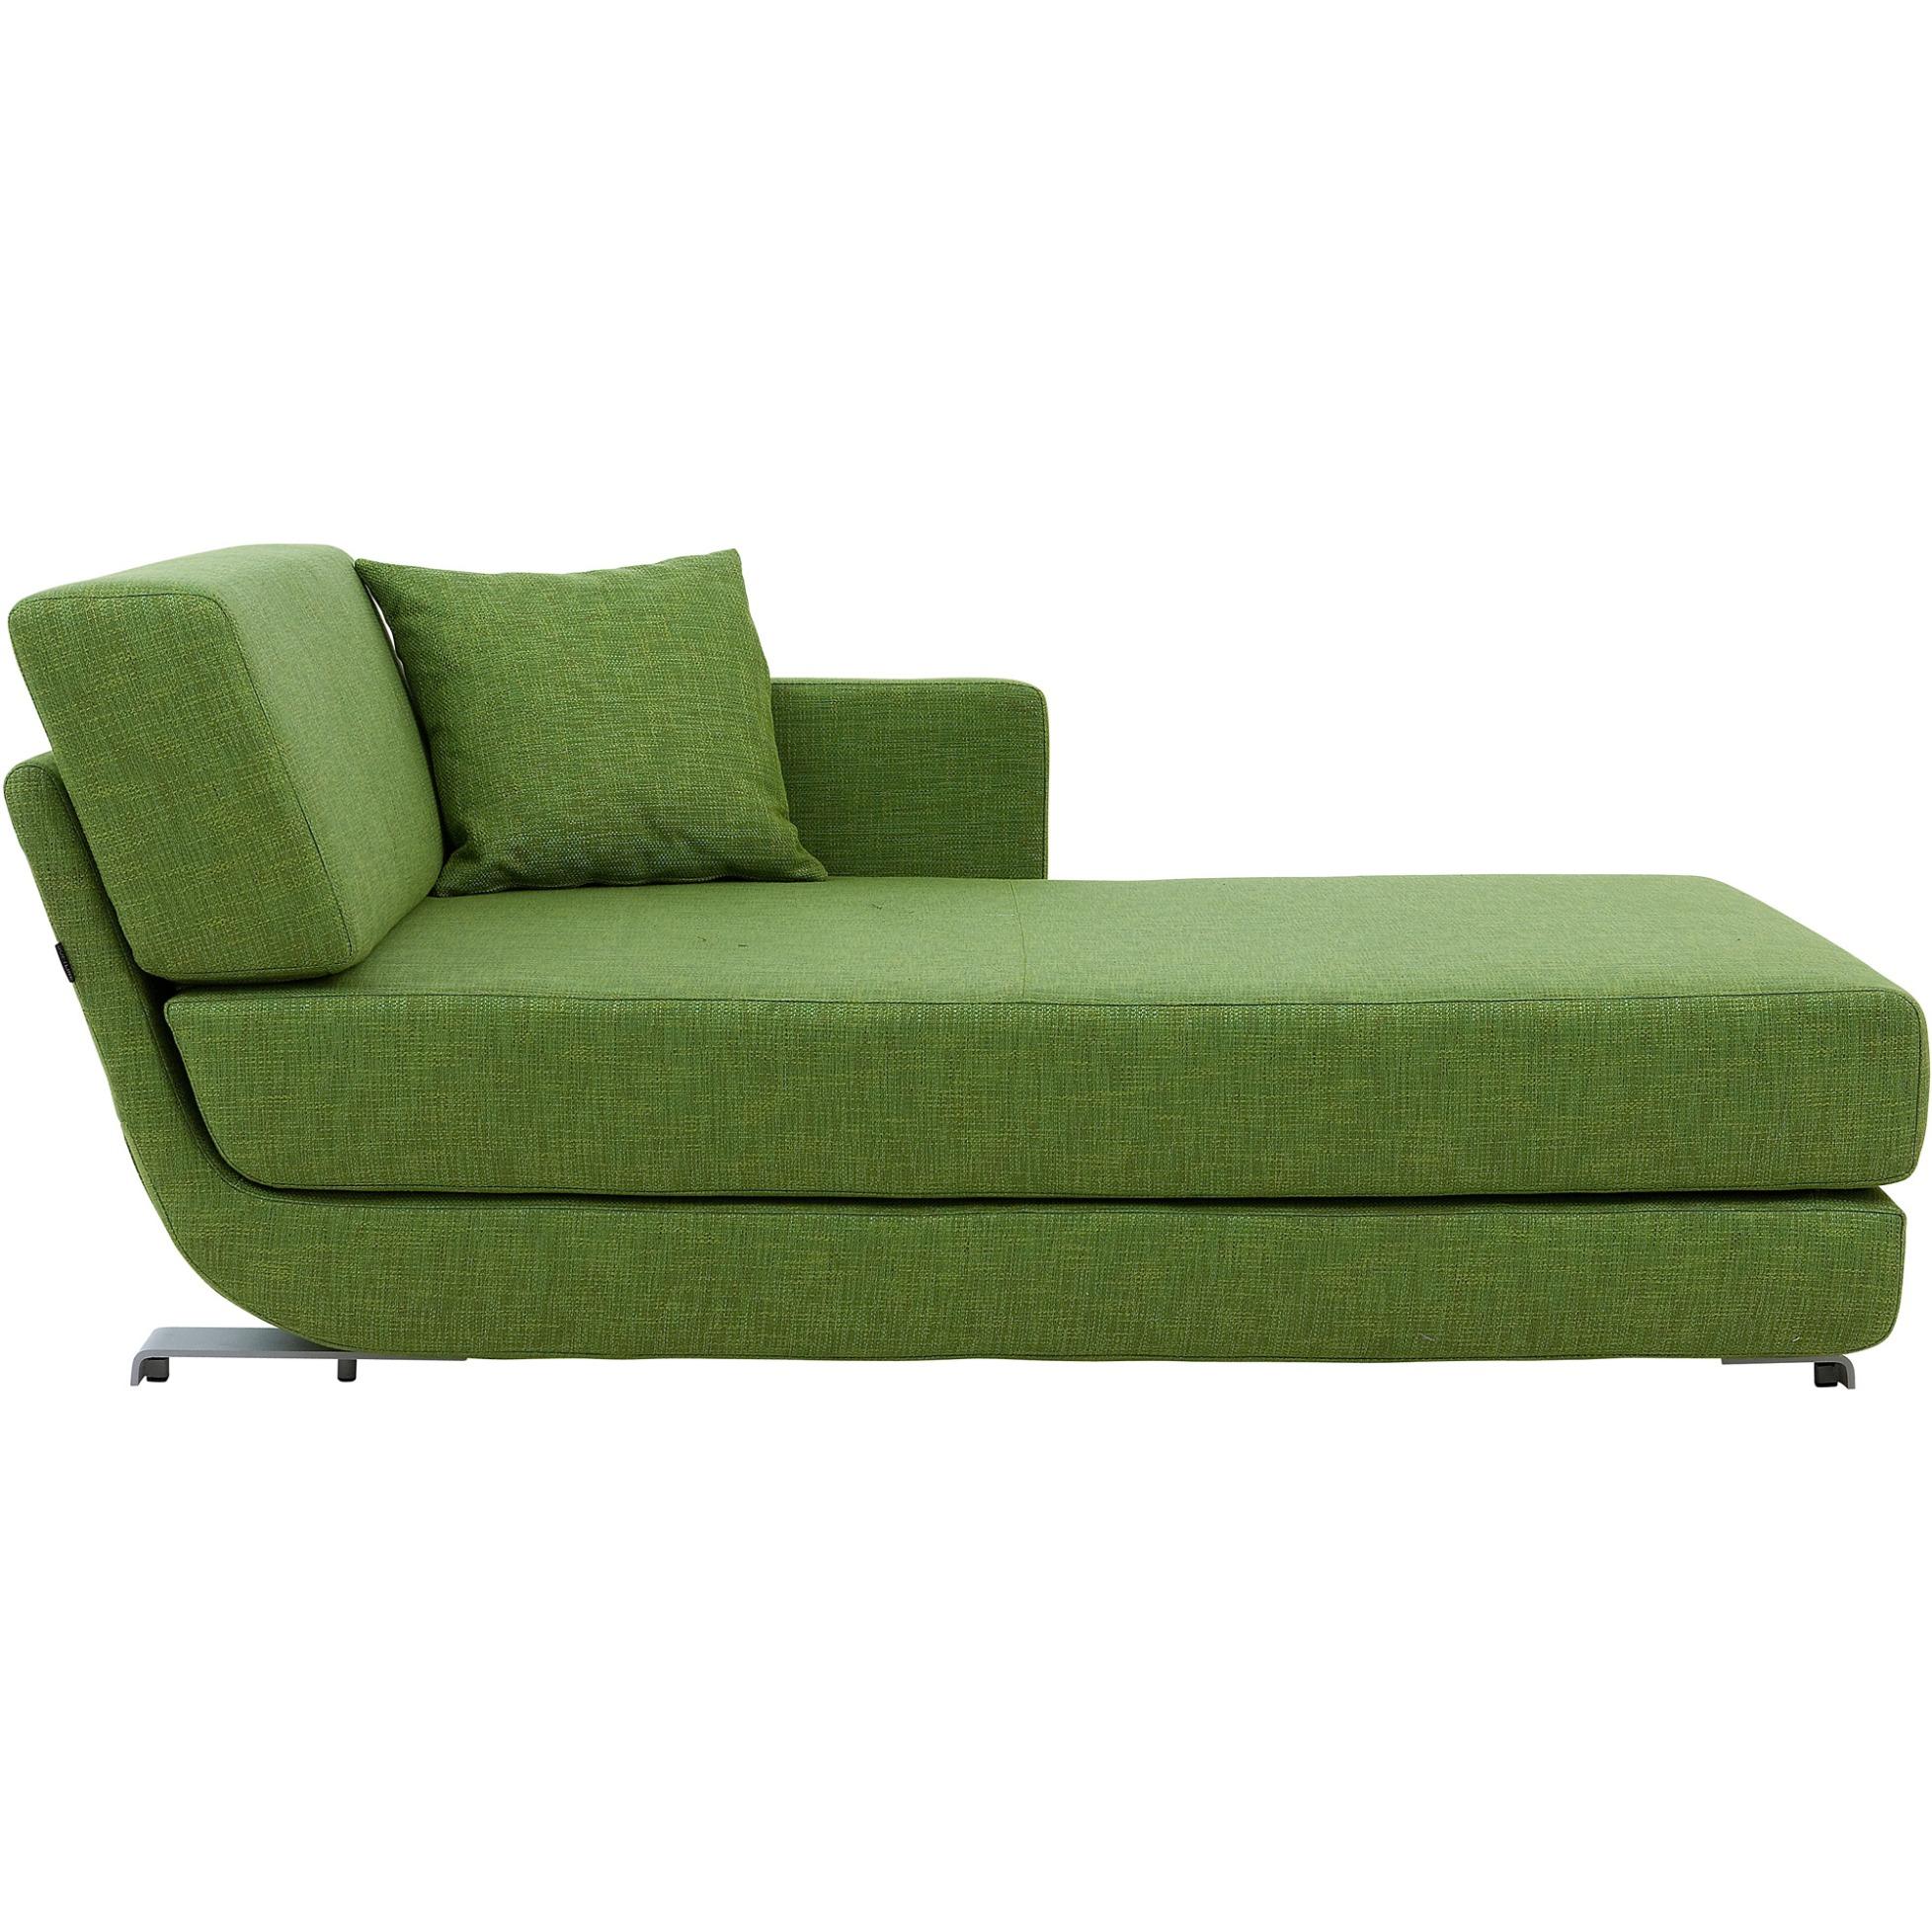 chaiselongue lounge von softline. Black Bedroom Furniture Sets. Home Design Ideas